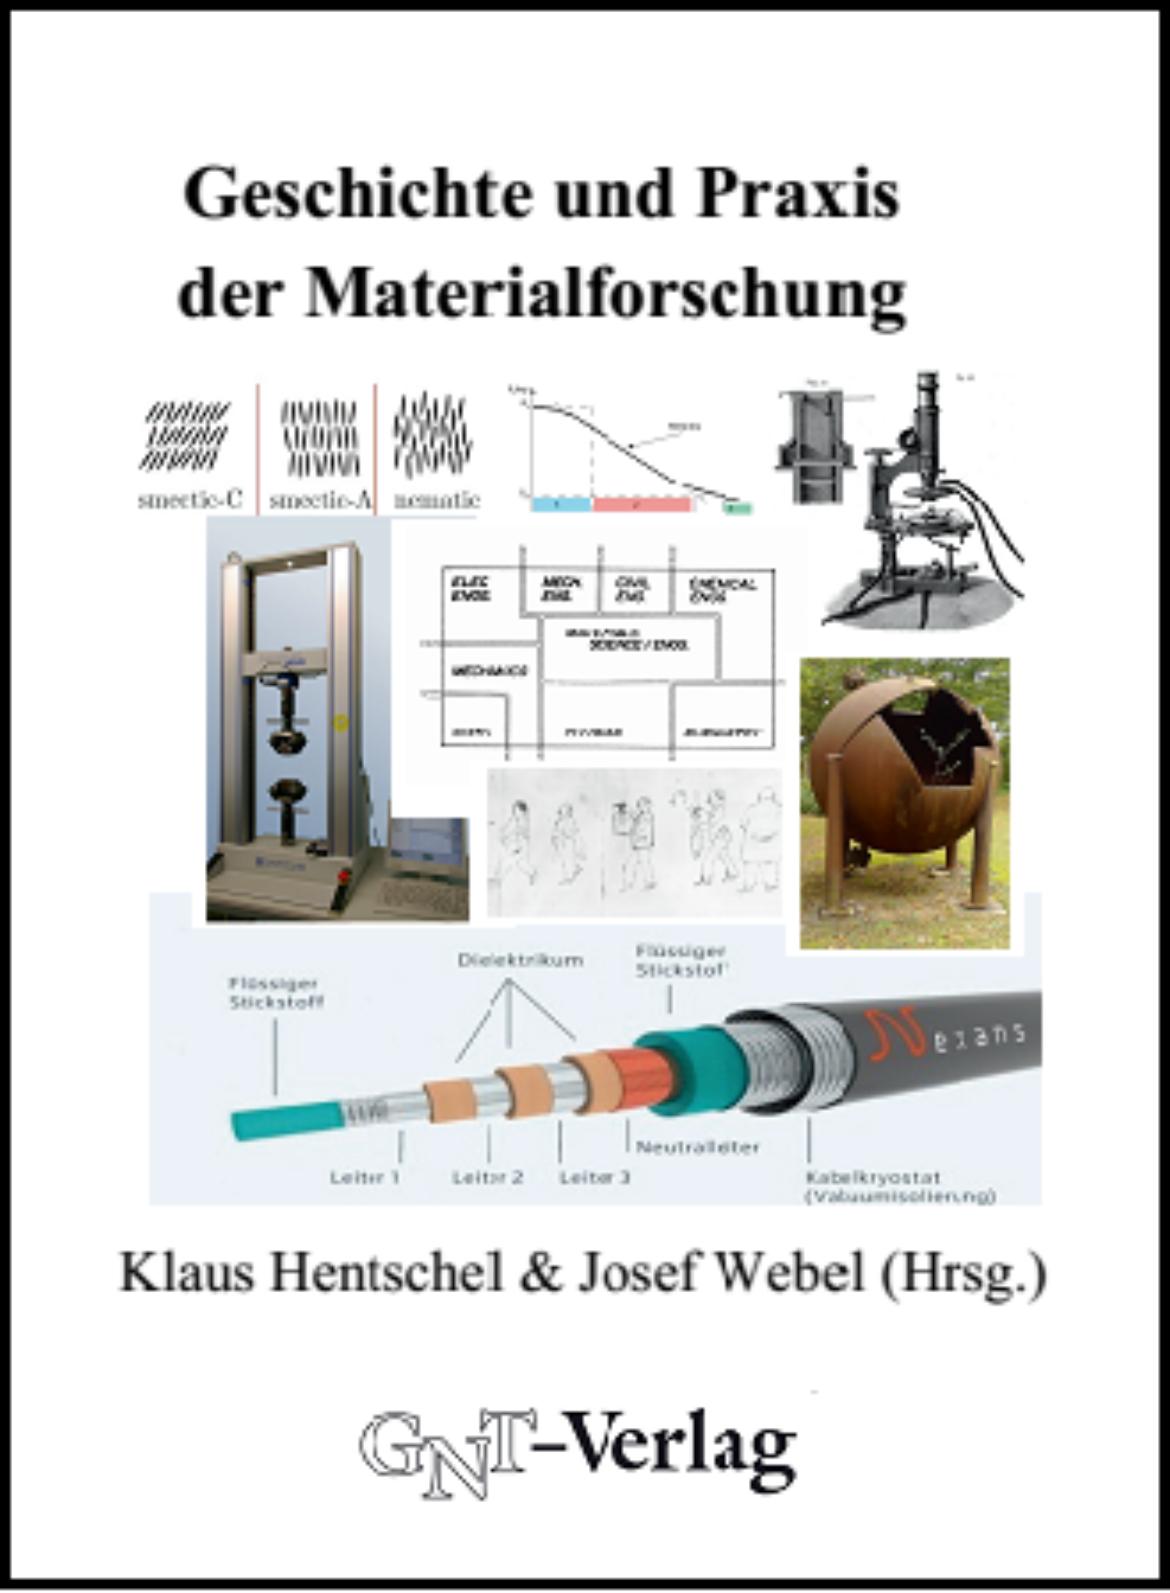 Geschichte und Praxis der Materialforschung